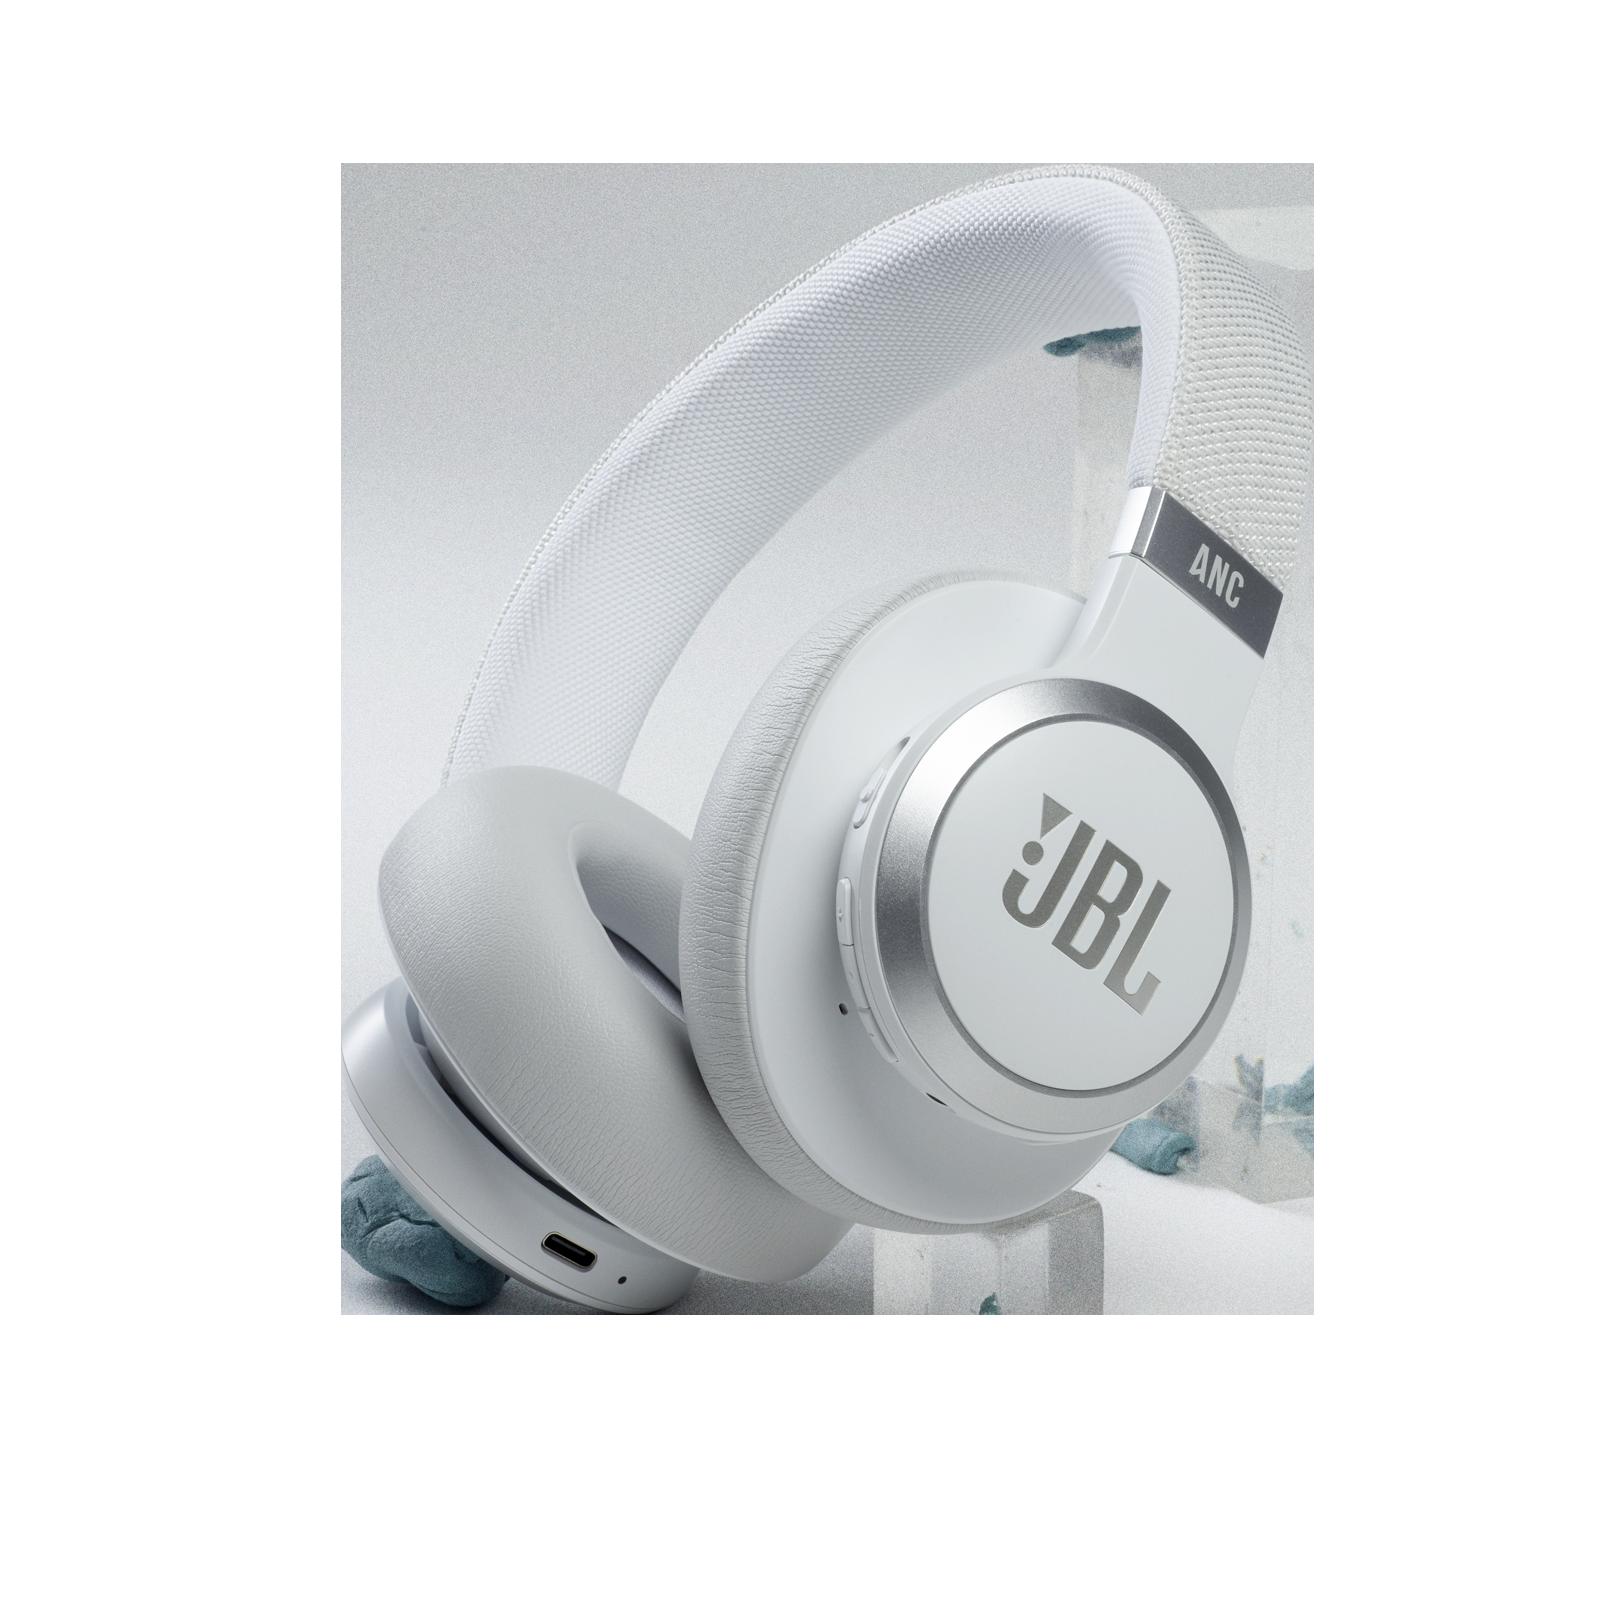 JBL Live 660NC - White - Wireless over-ear NC headphones - Hero